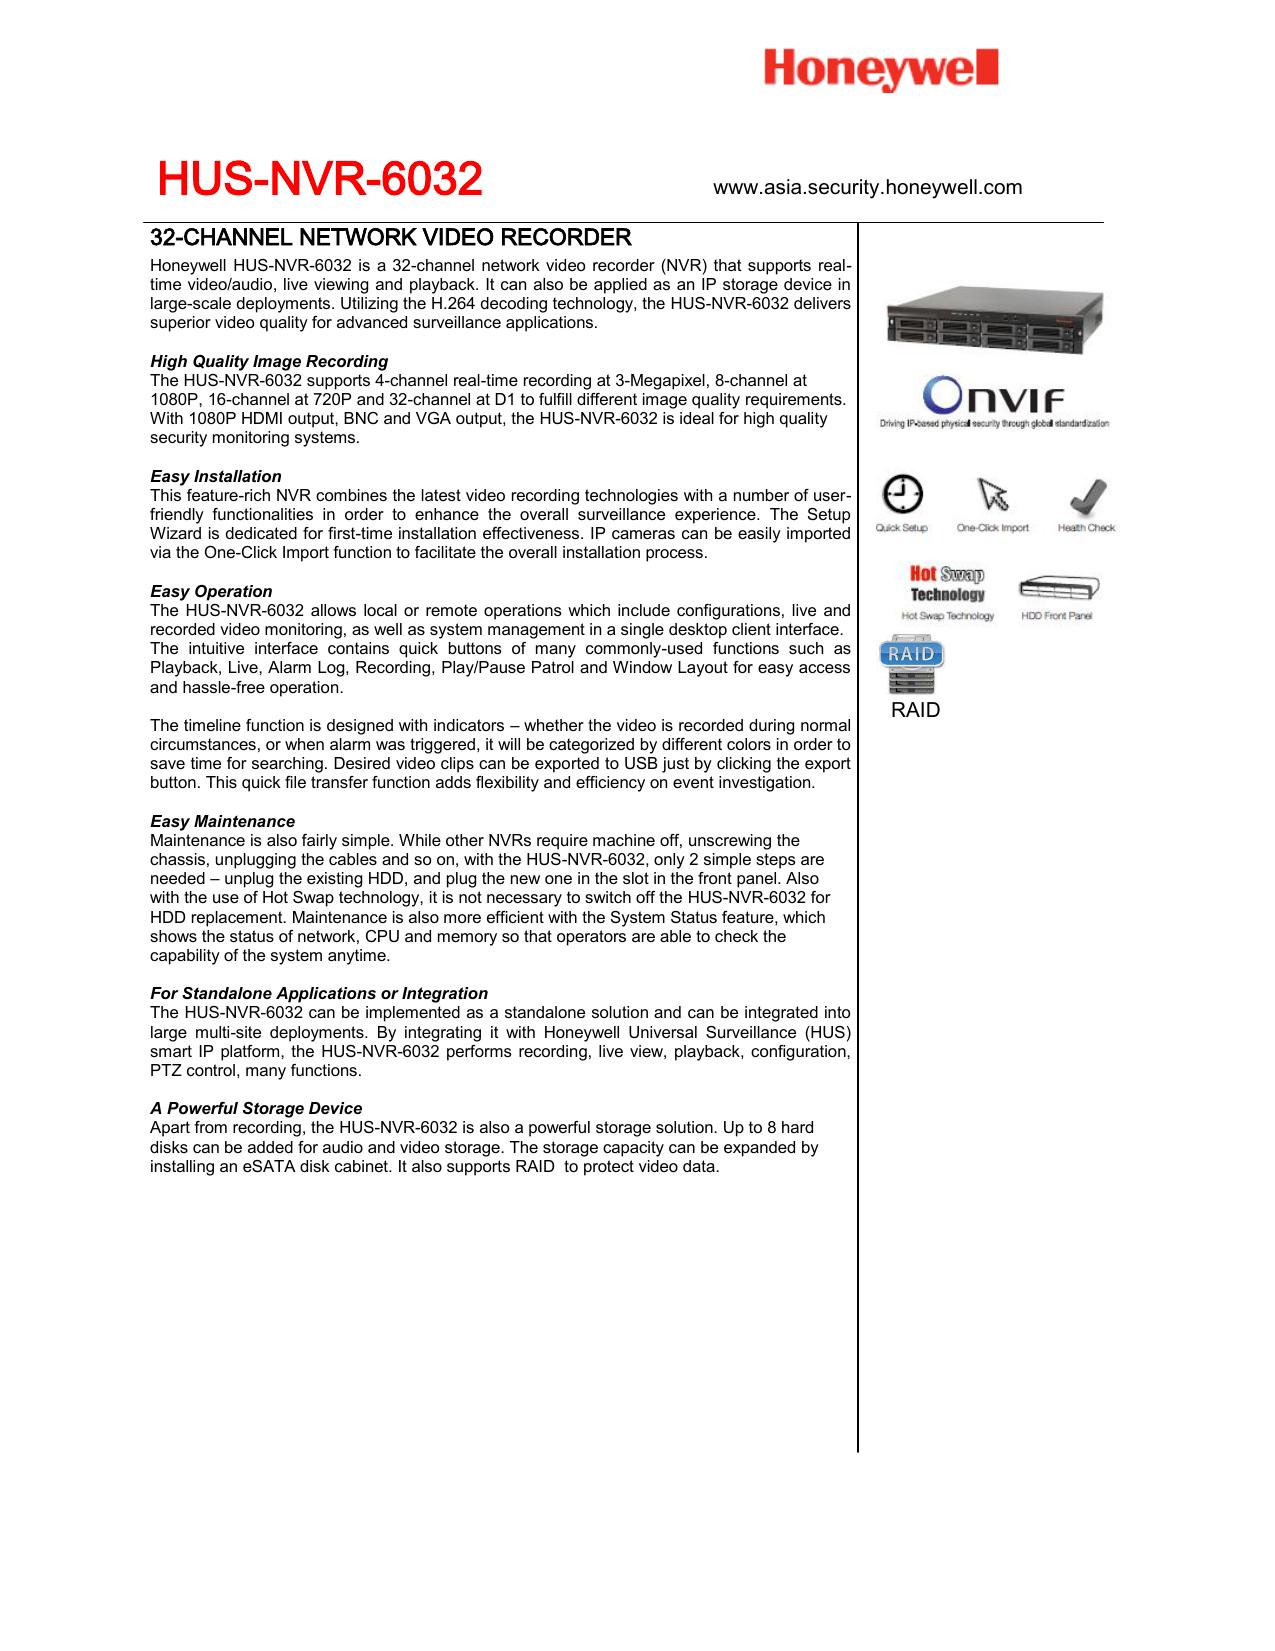 HUS-NVR-6032 - Honeywell Partner Connect | manualzz com